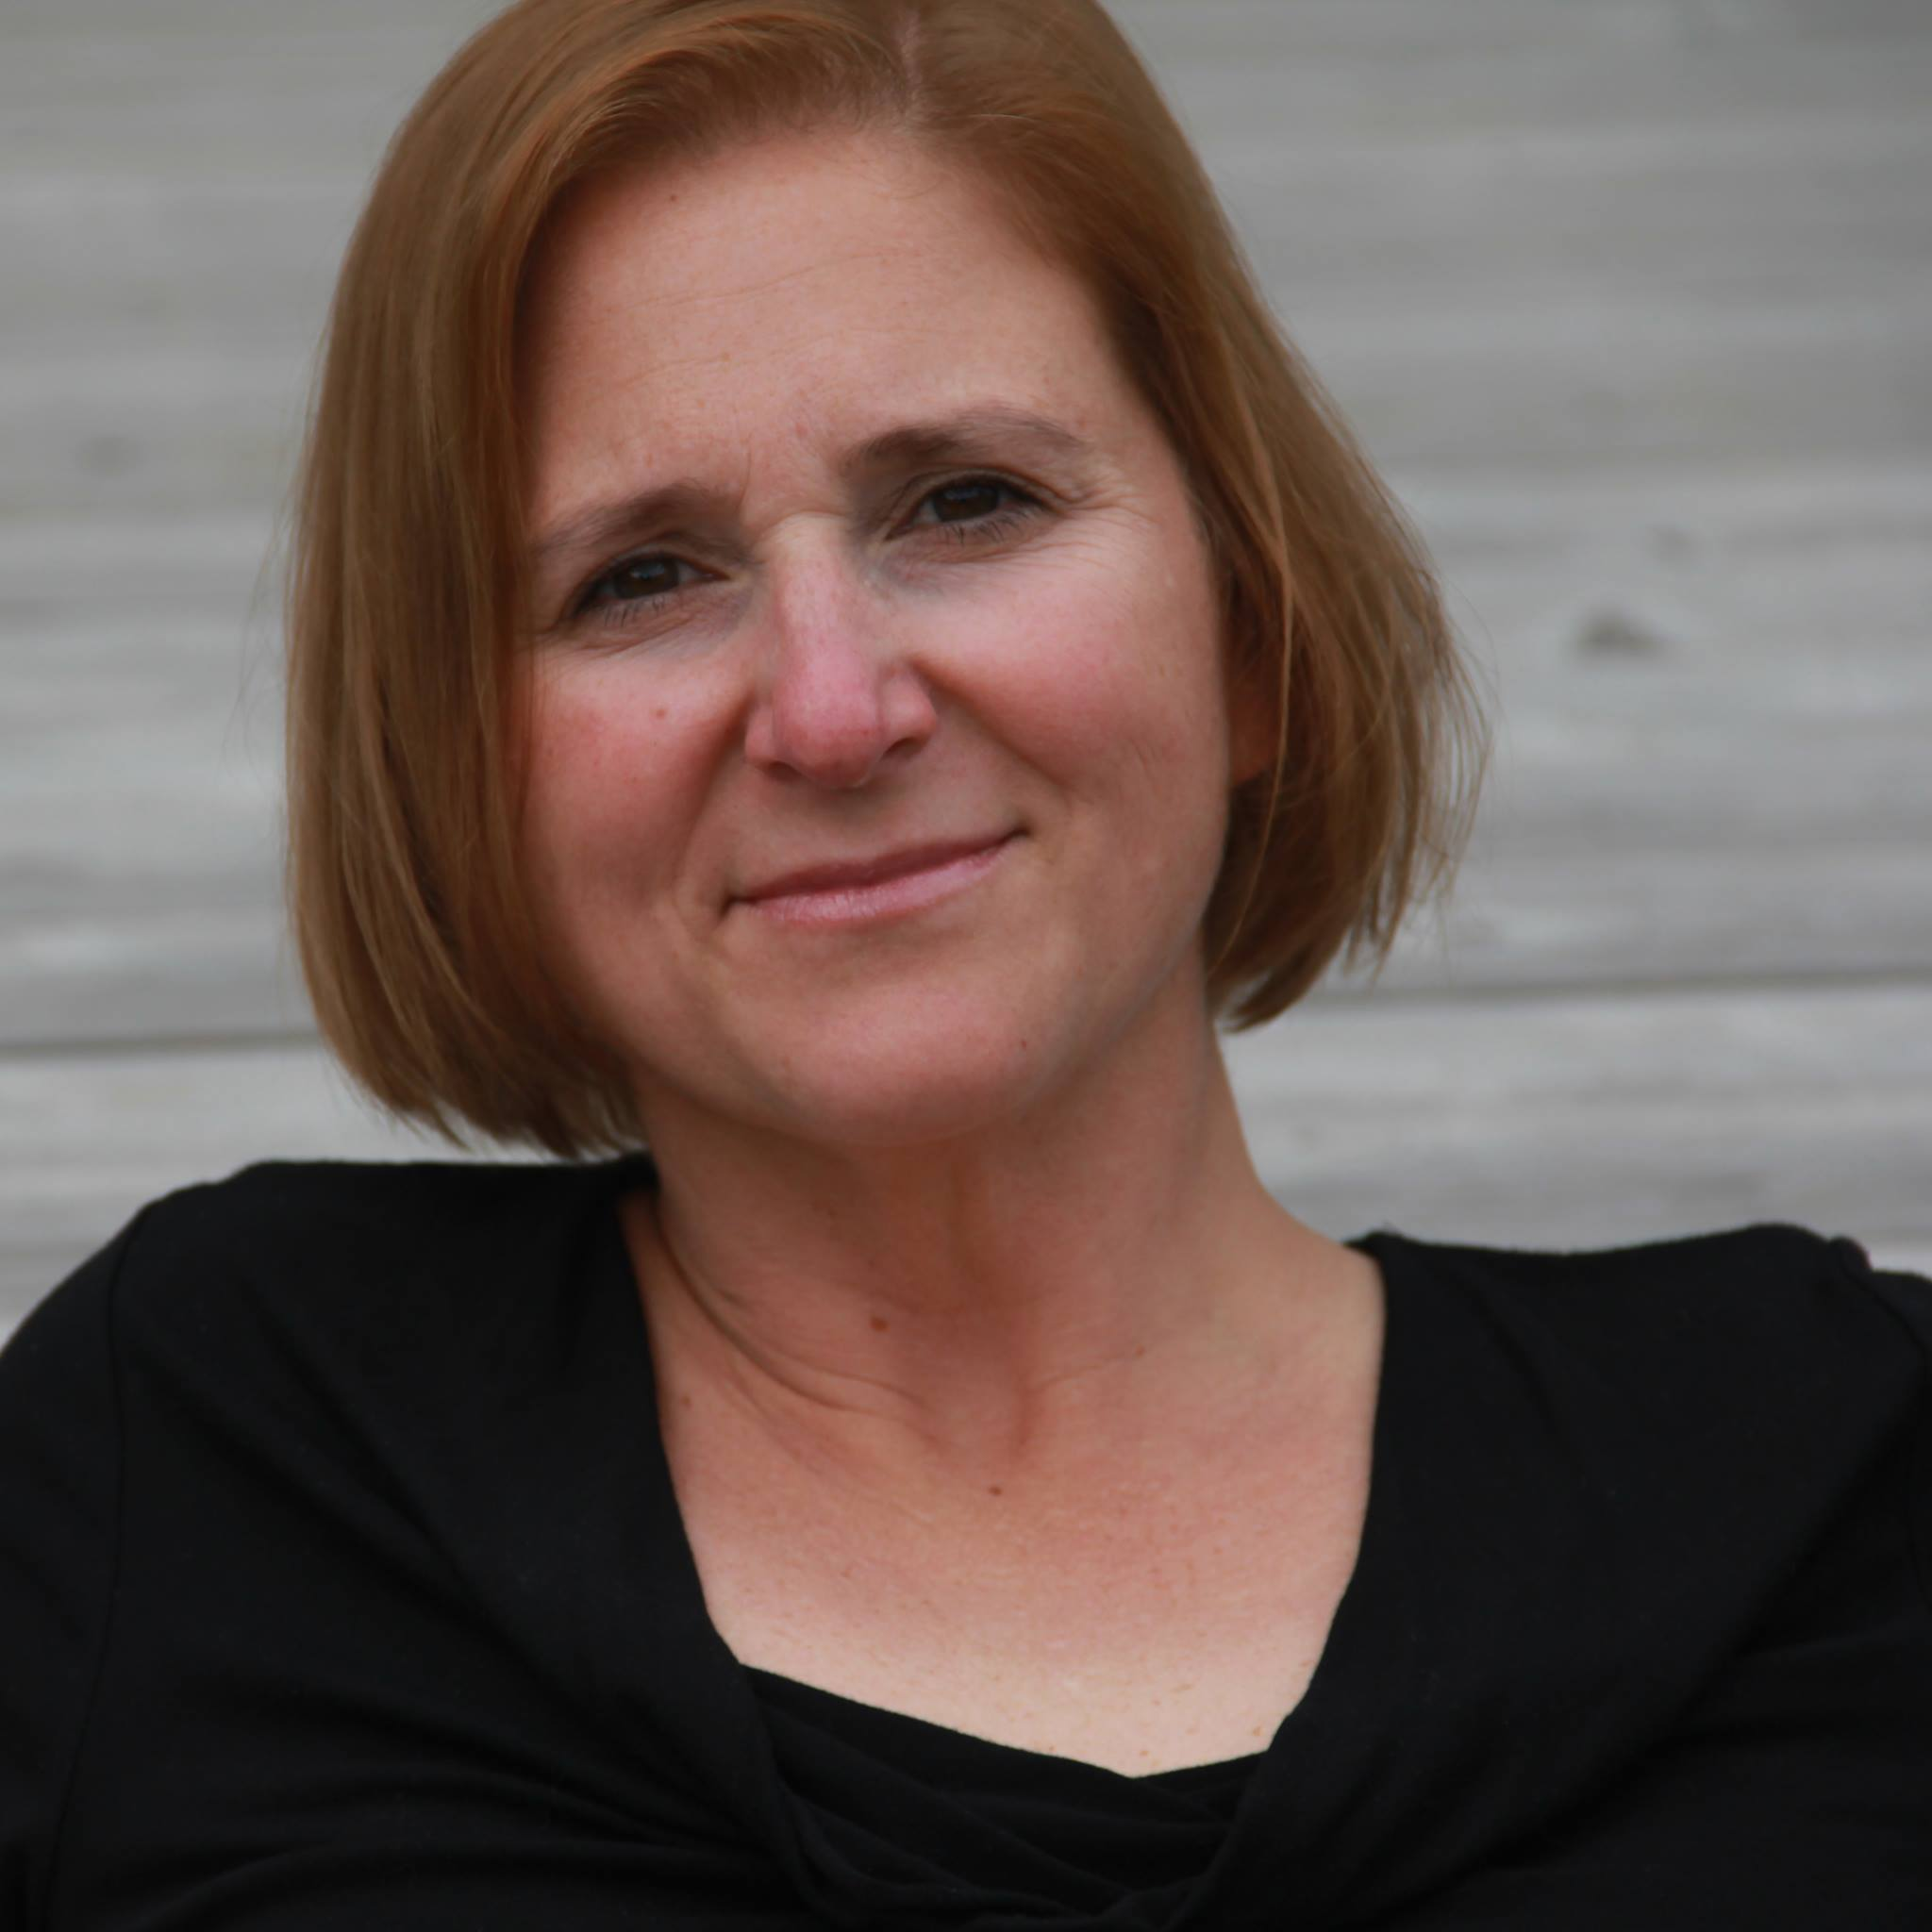 Dr. Catherine Hajnal